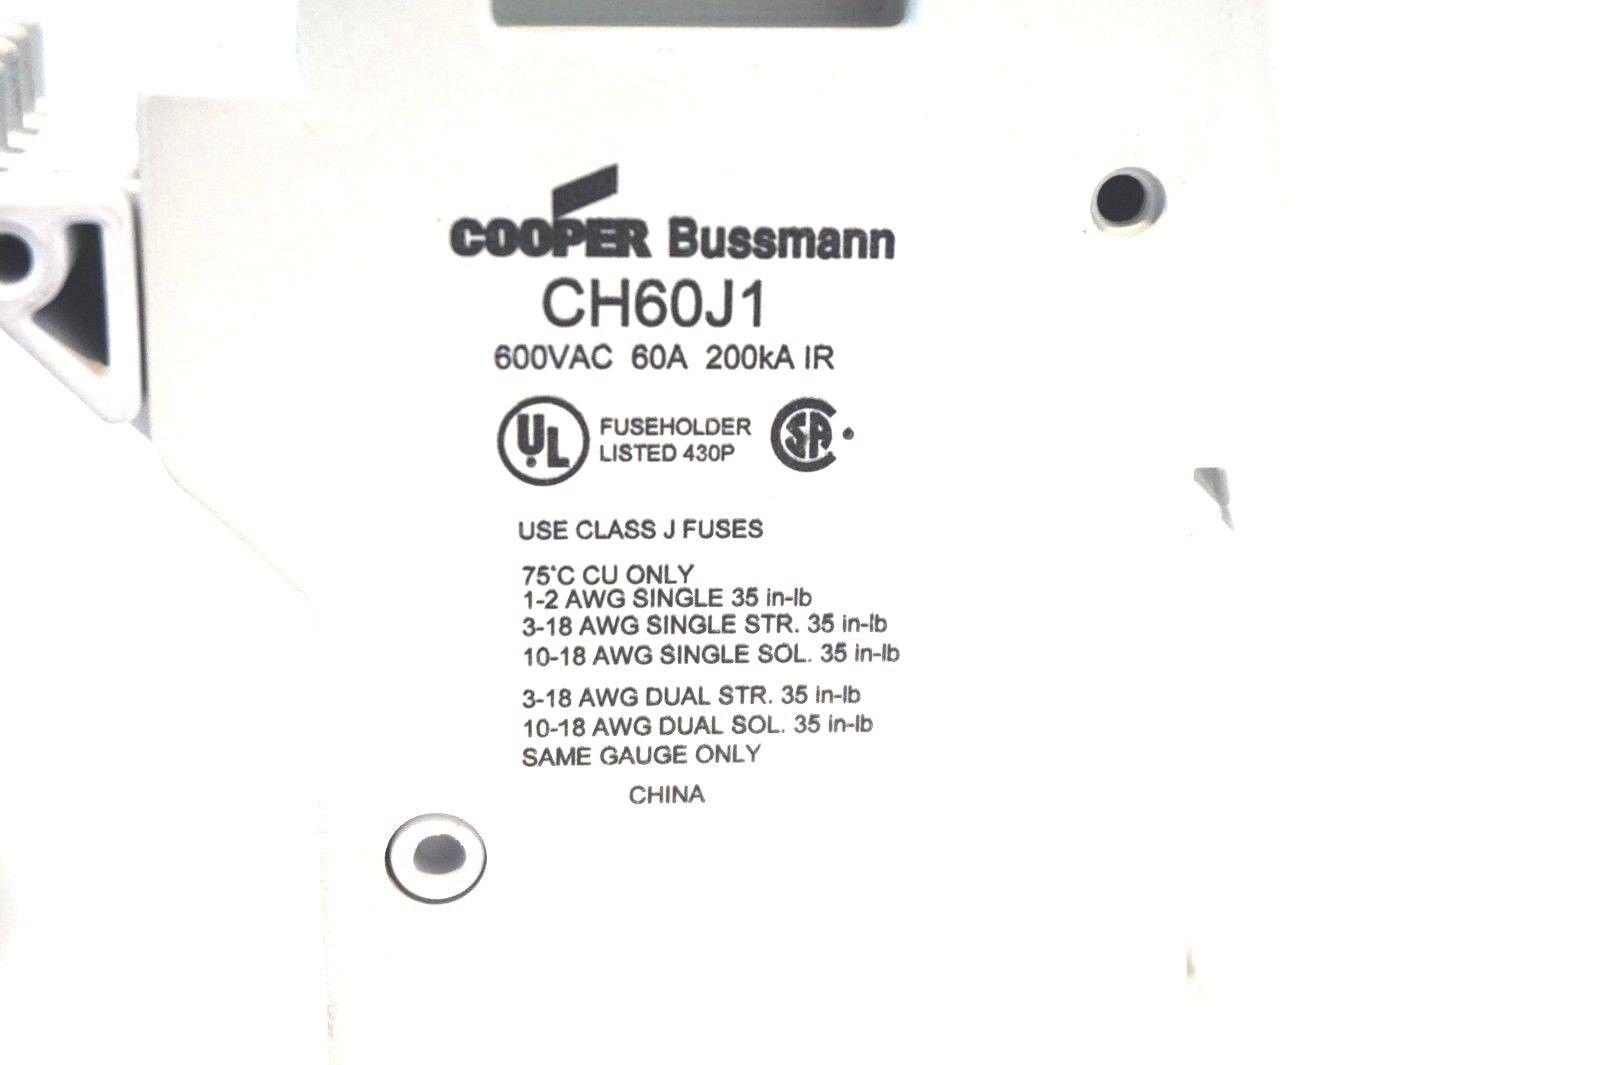 3 NEW BUSSMANN CH60J1 FUSE HOLDERS